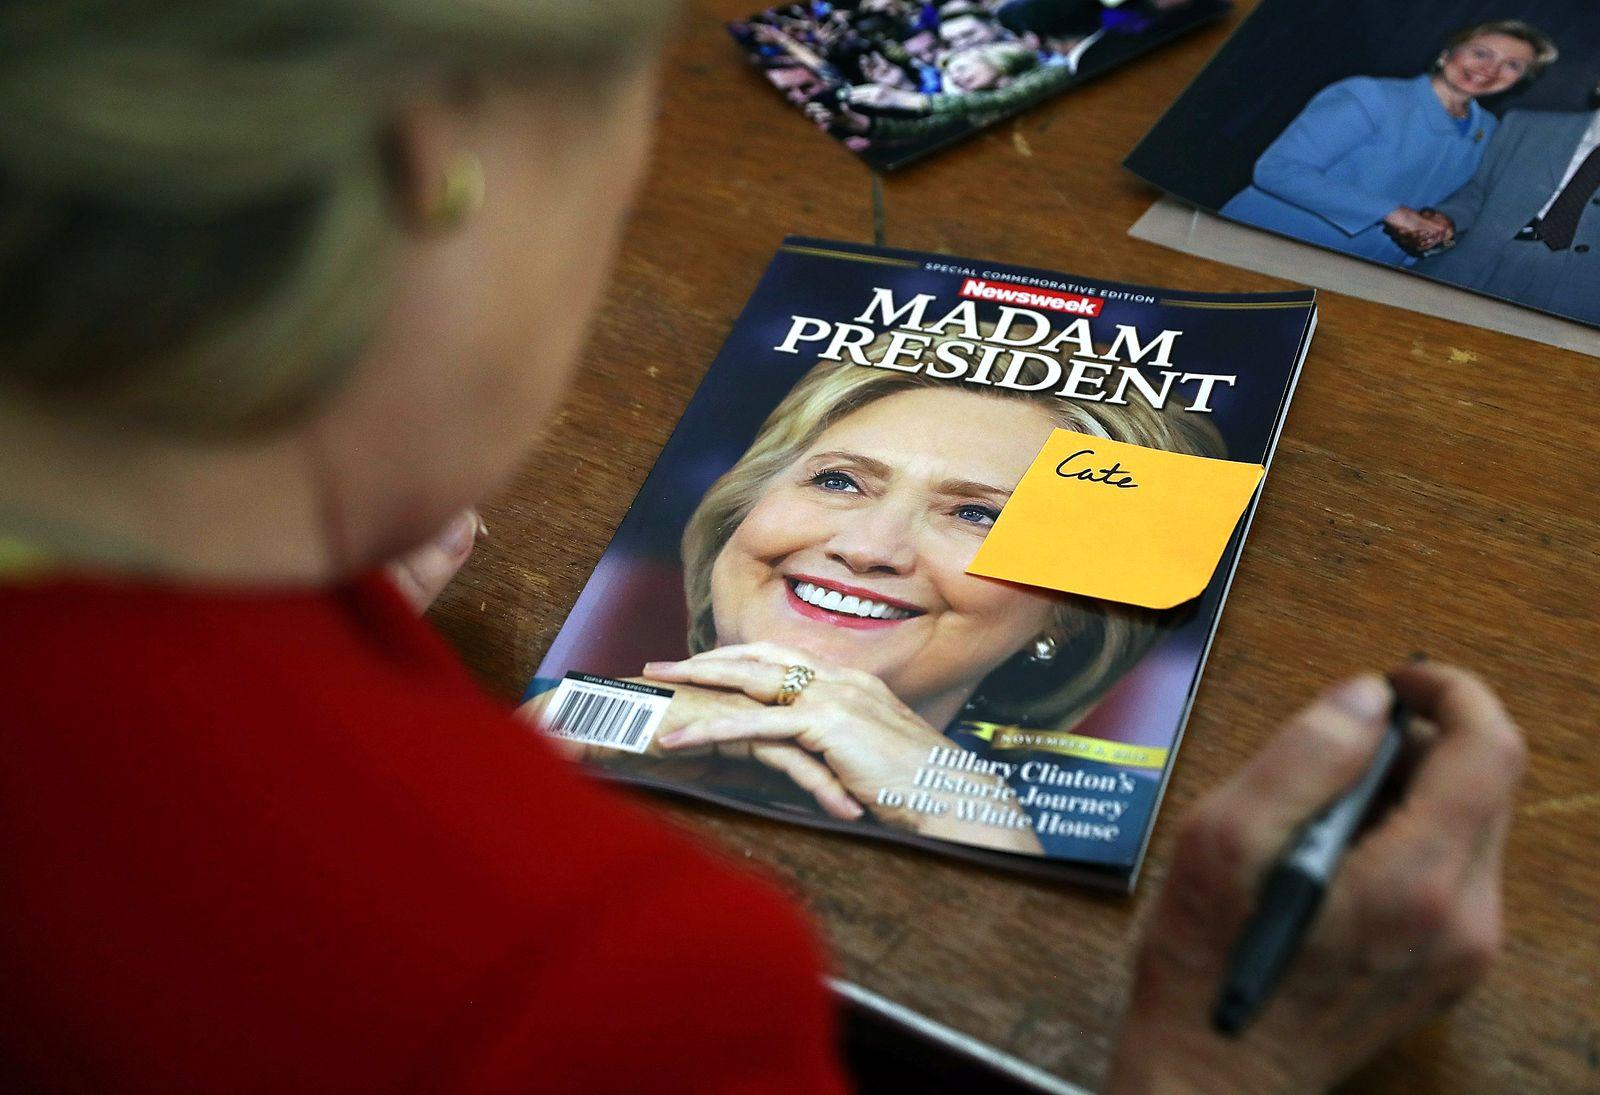 Newsweek/ Hillary Clinton